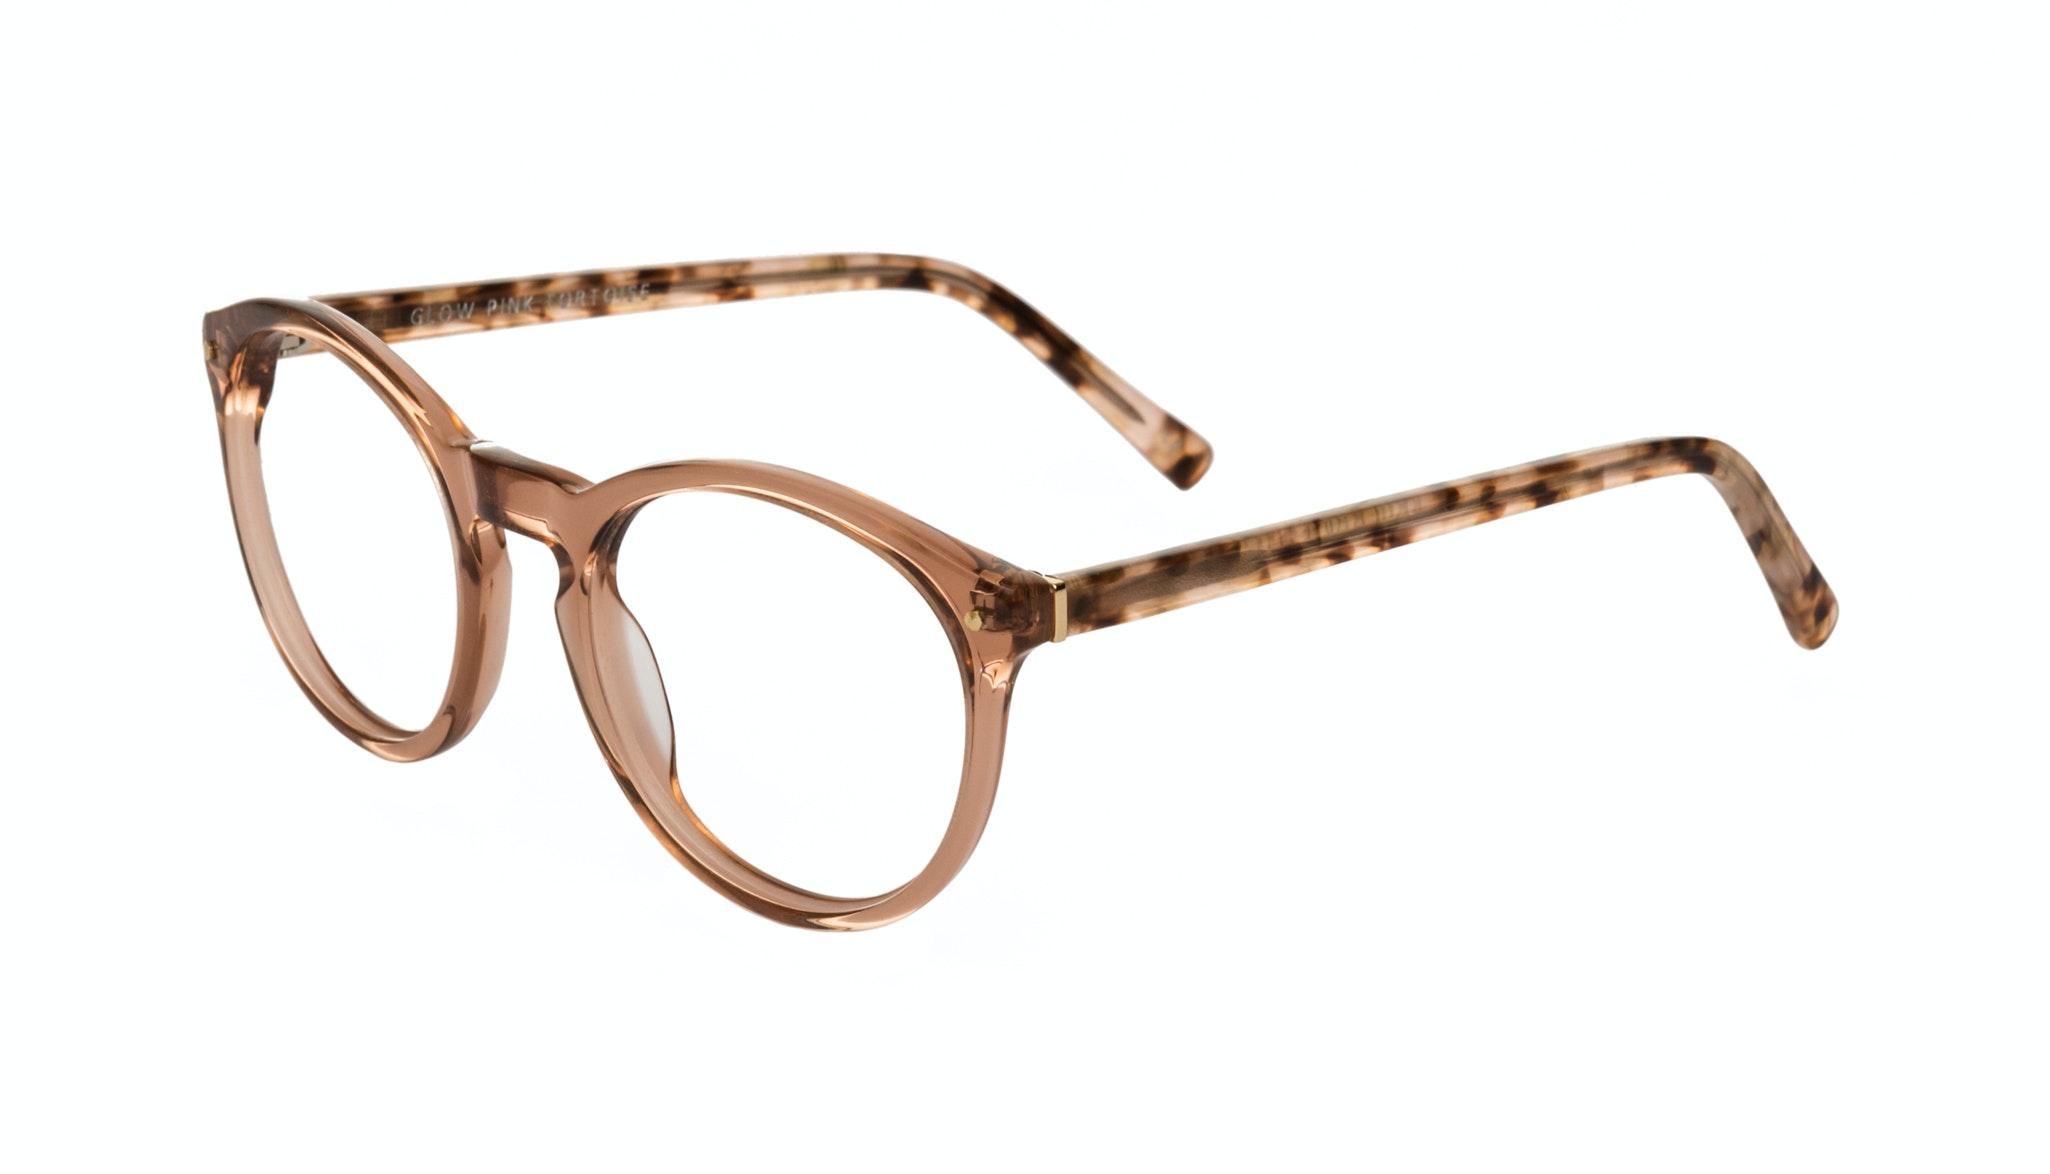 Affordable Fashion Glasses Round Eyeglasses Women Glow Pink Tortoise Tilt